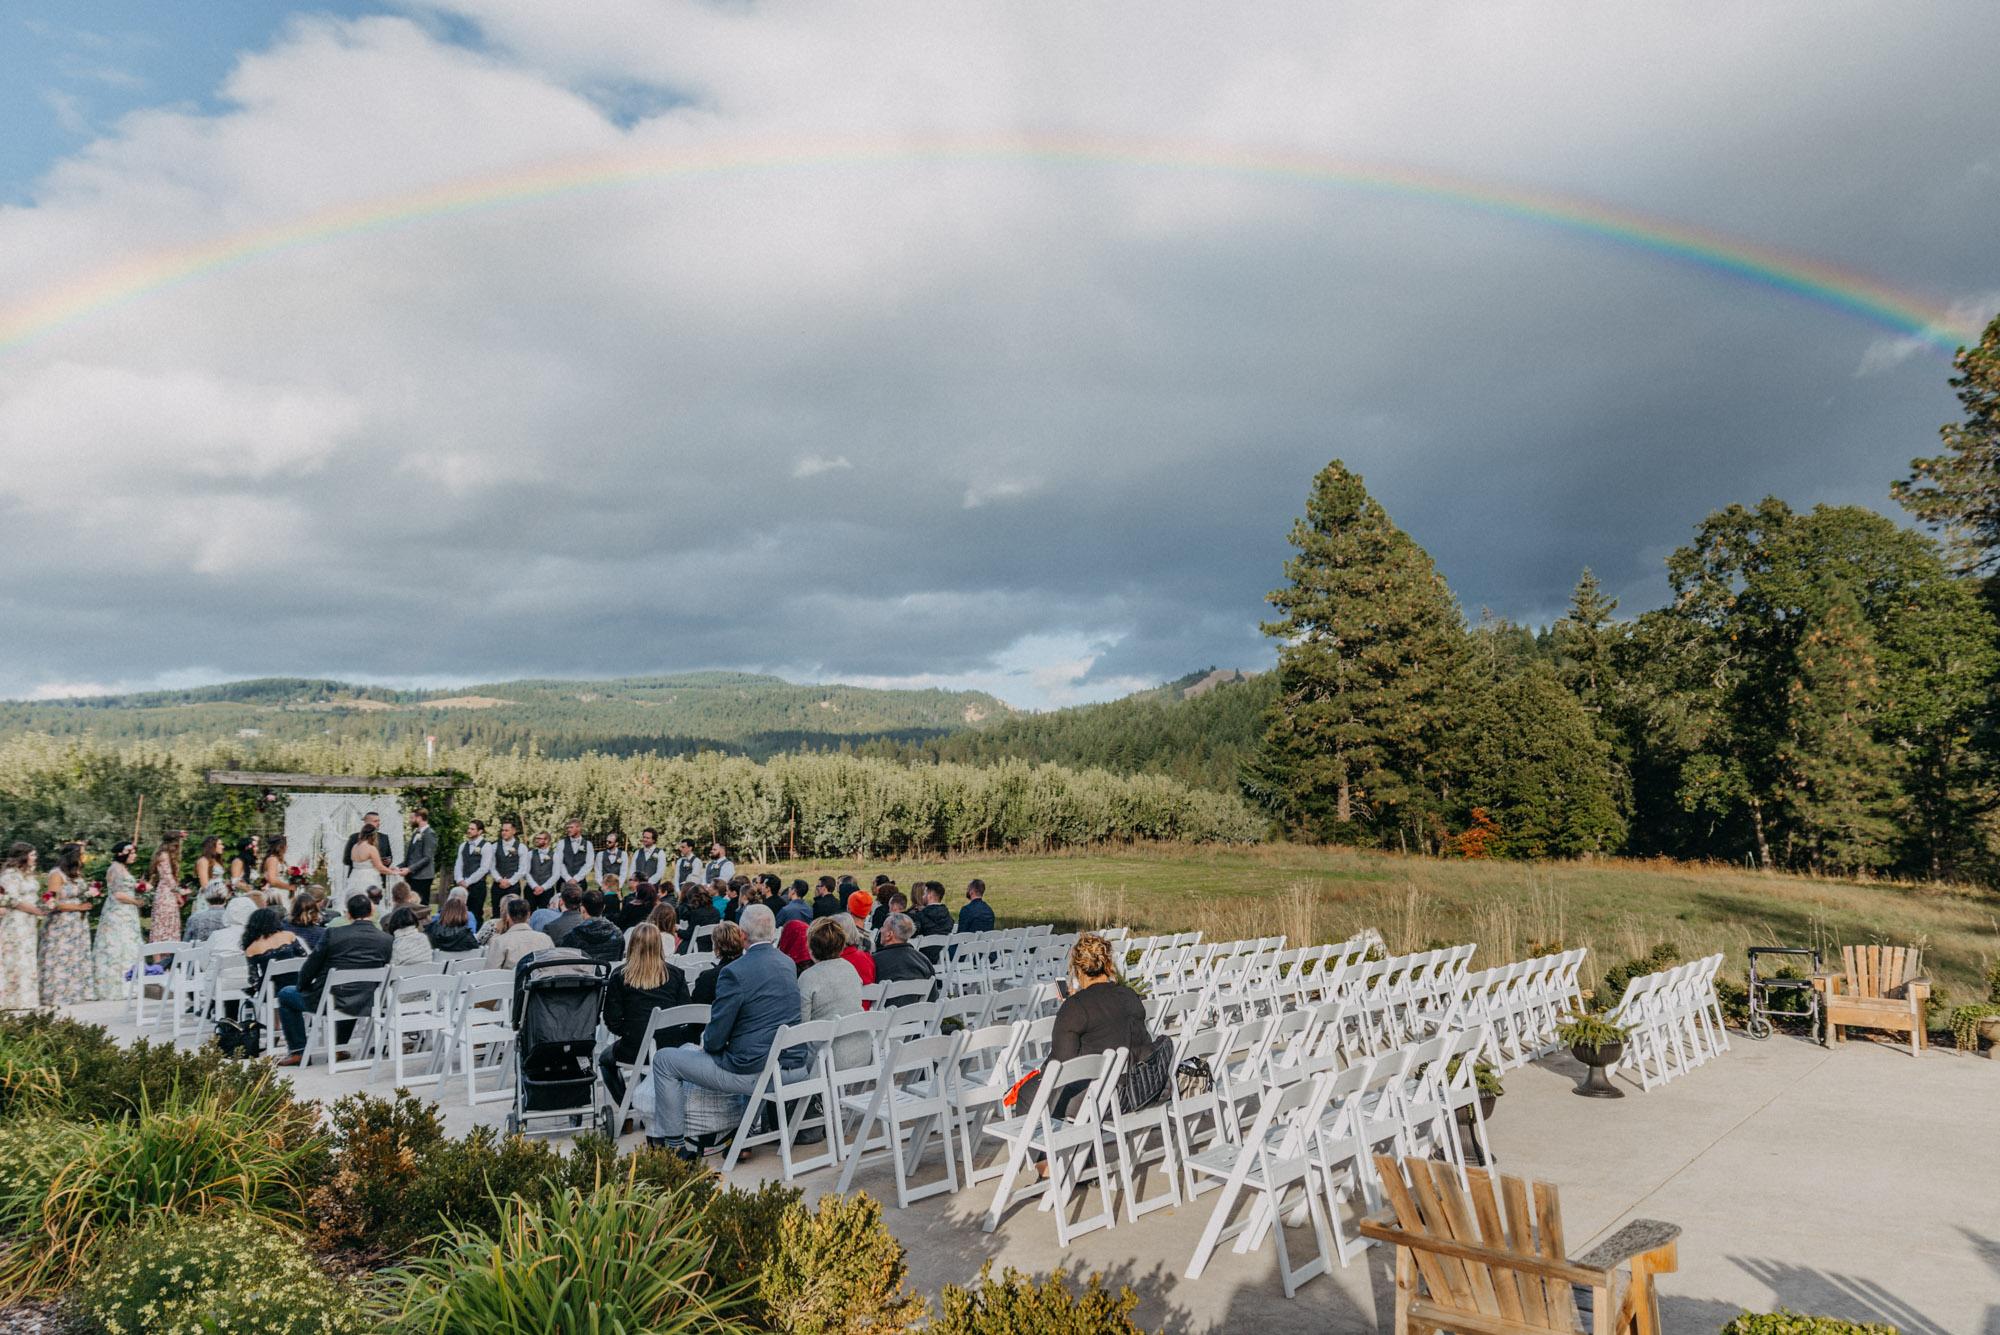 Outdoor-Summer-Ceremony-Washington-Wedding-Rainbow-.jpg